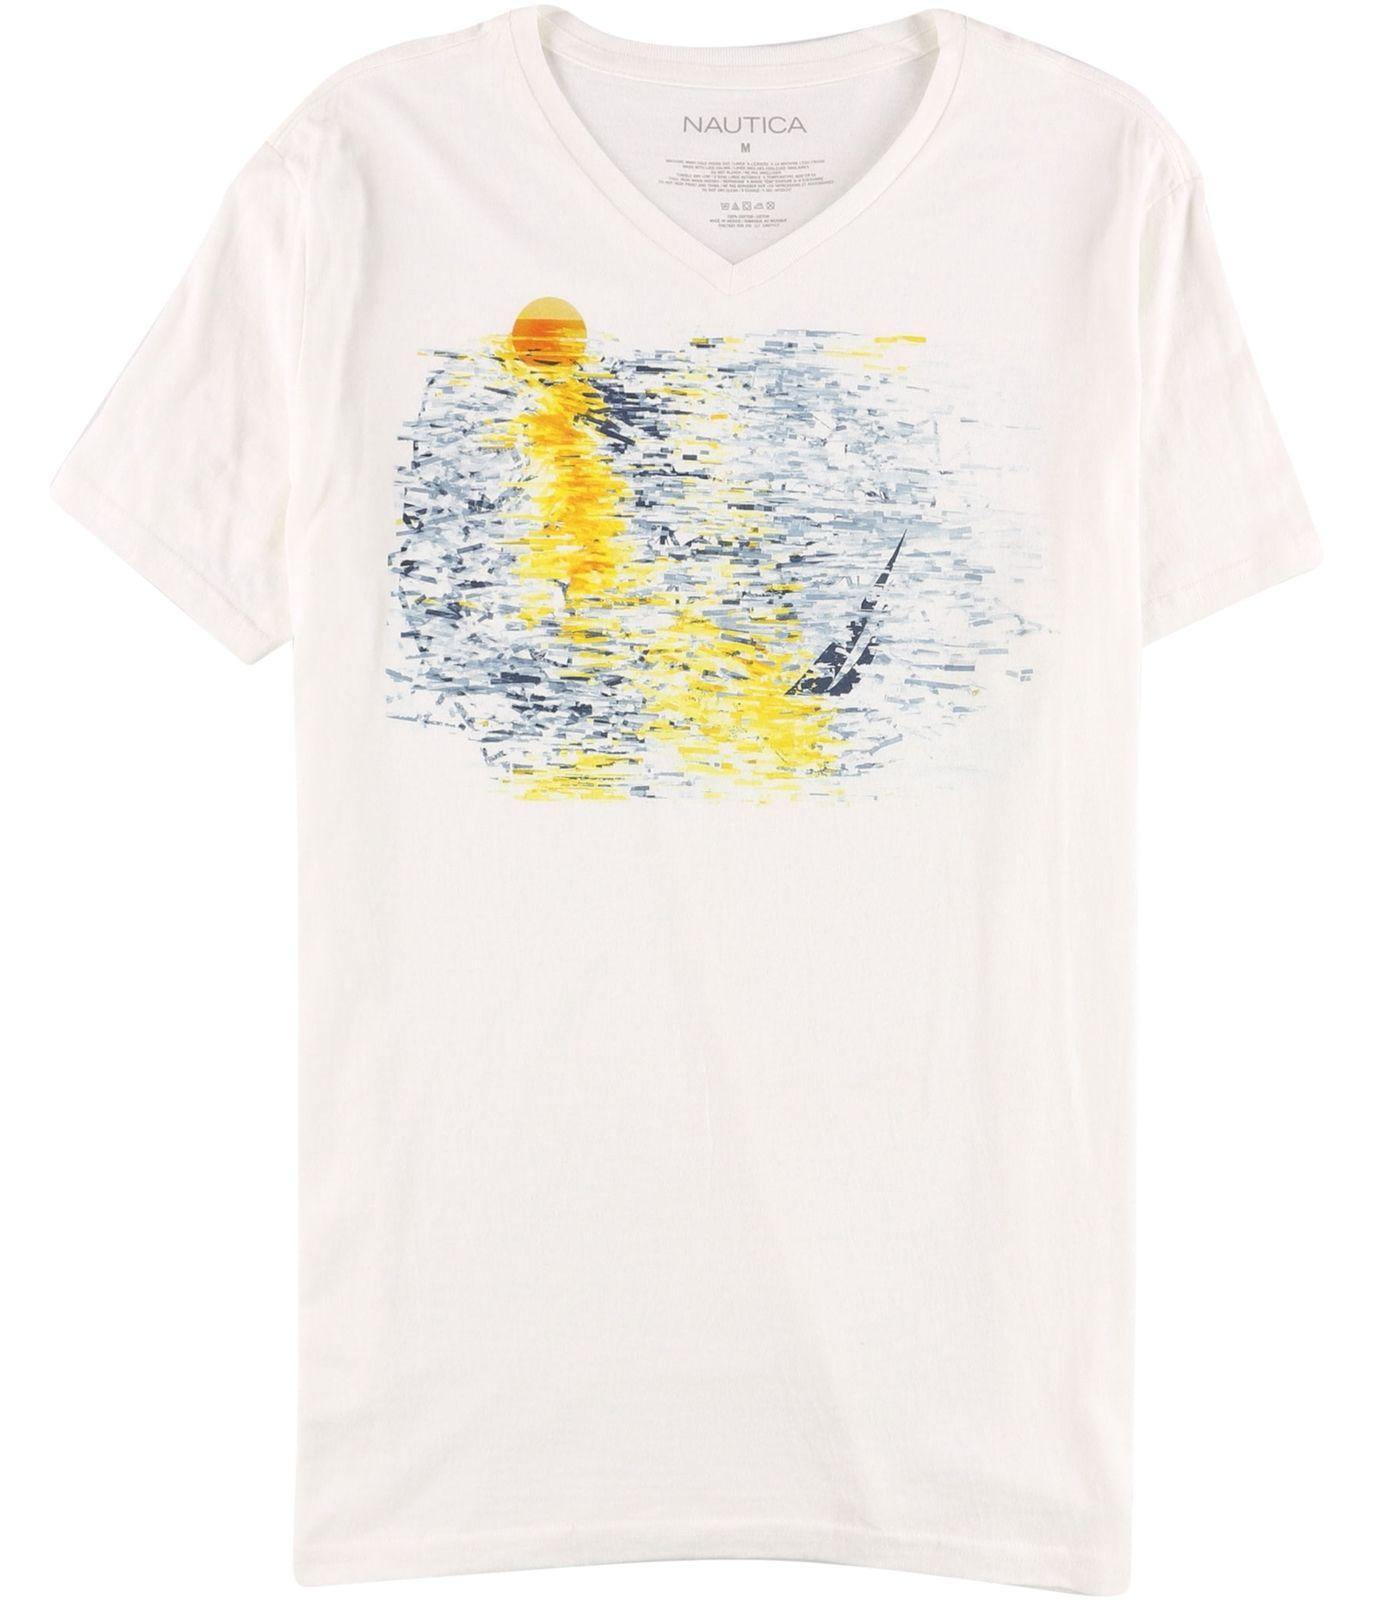 Nautica Mens Sea Graphic T Shirt White M 2018 New Pure Cotton Short